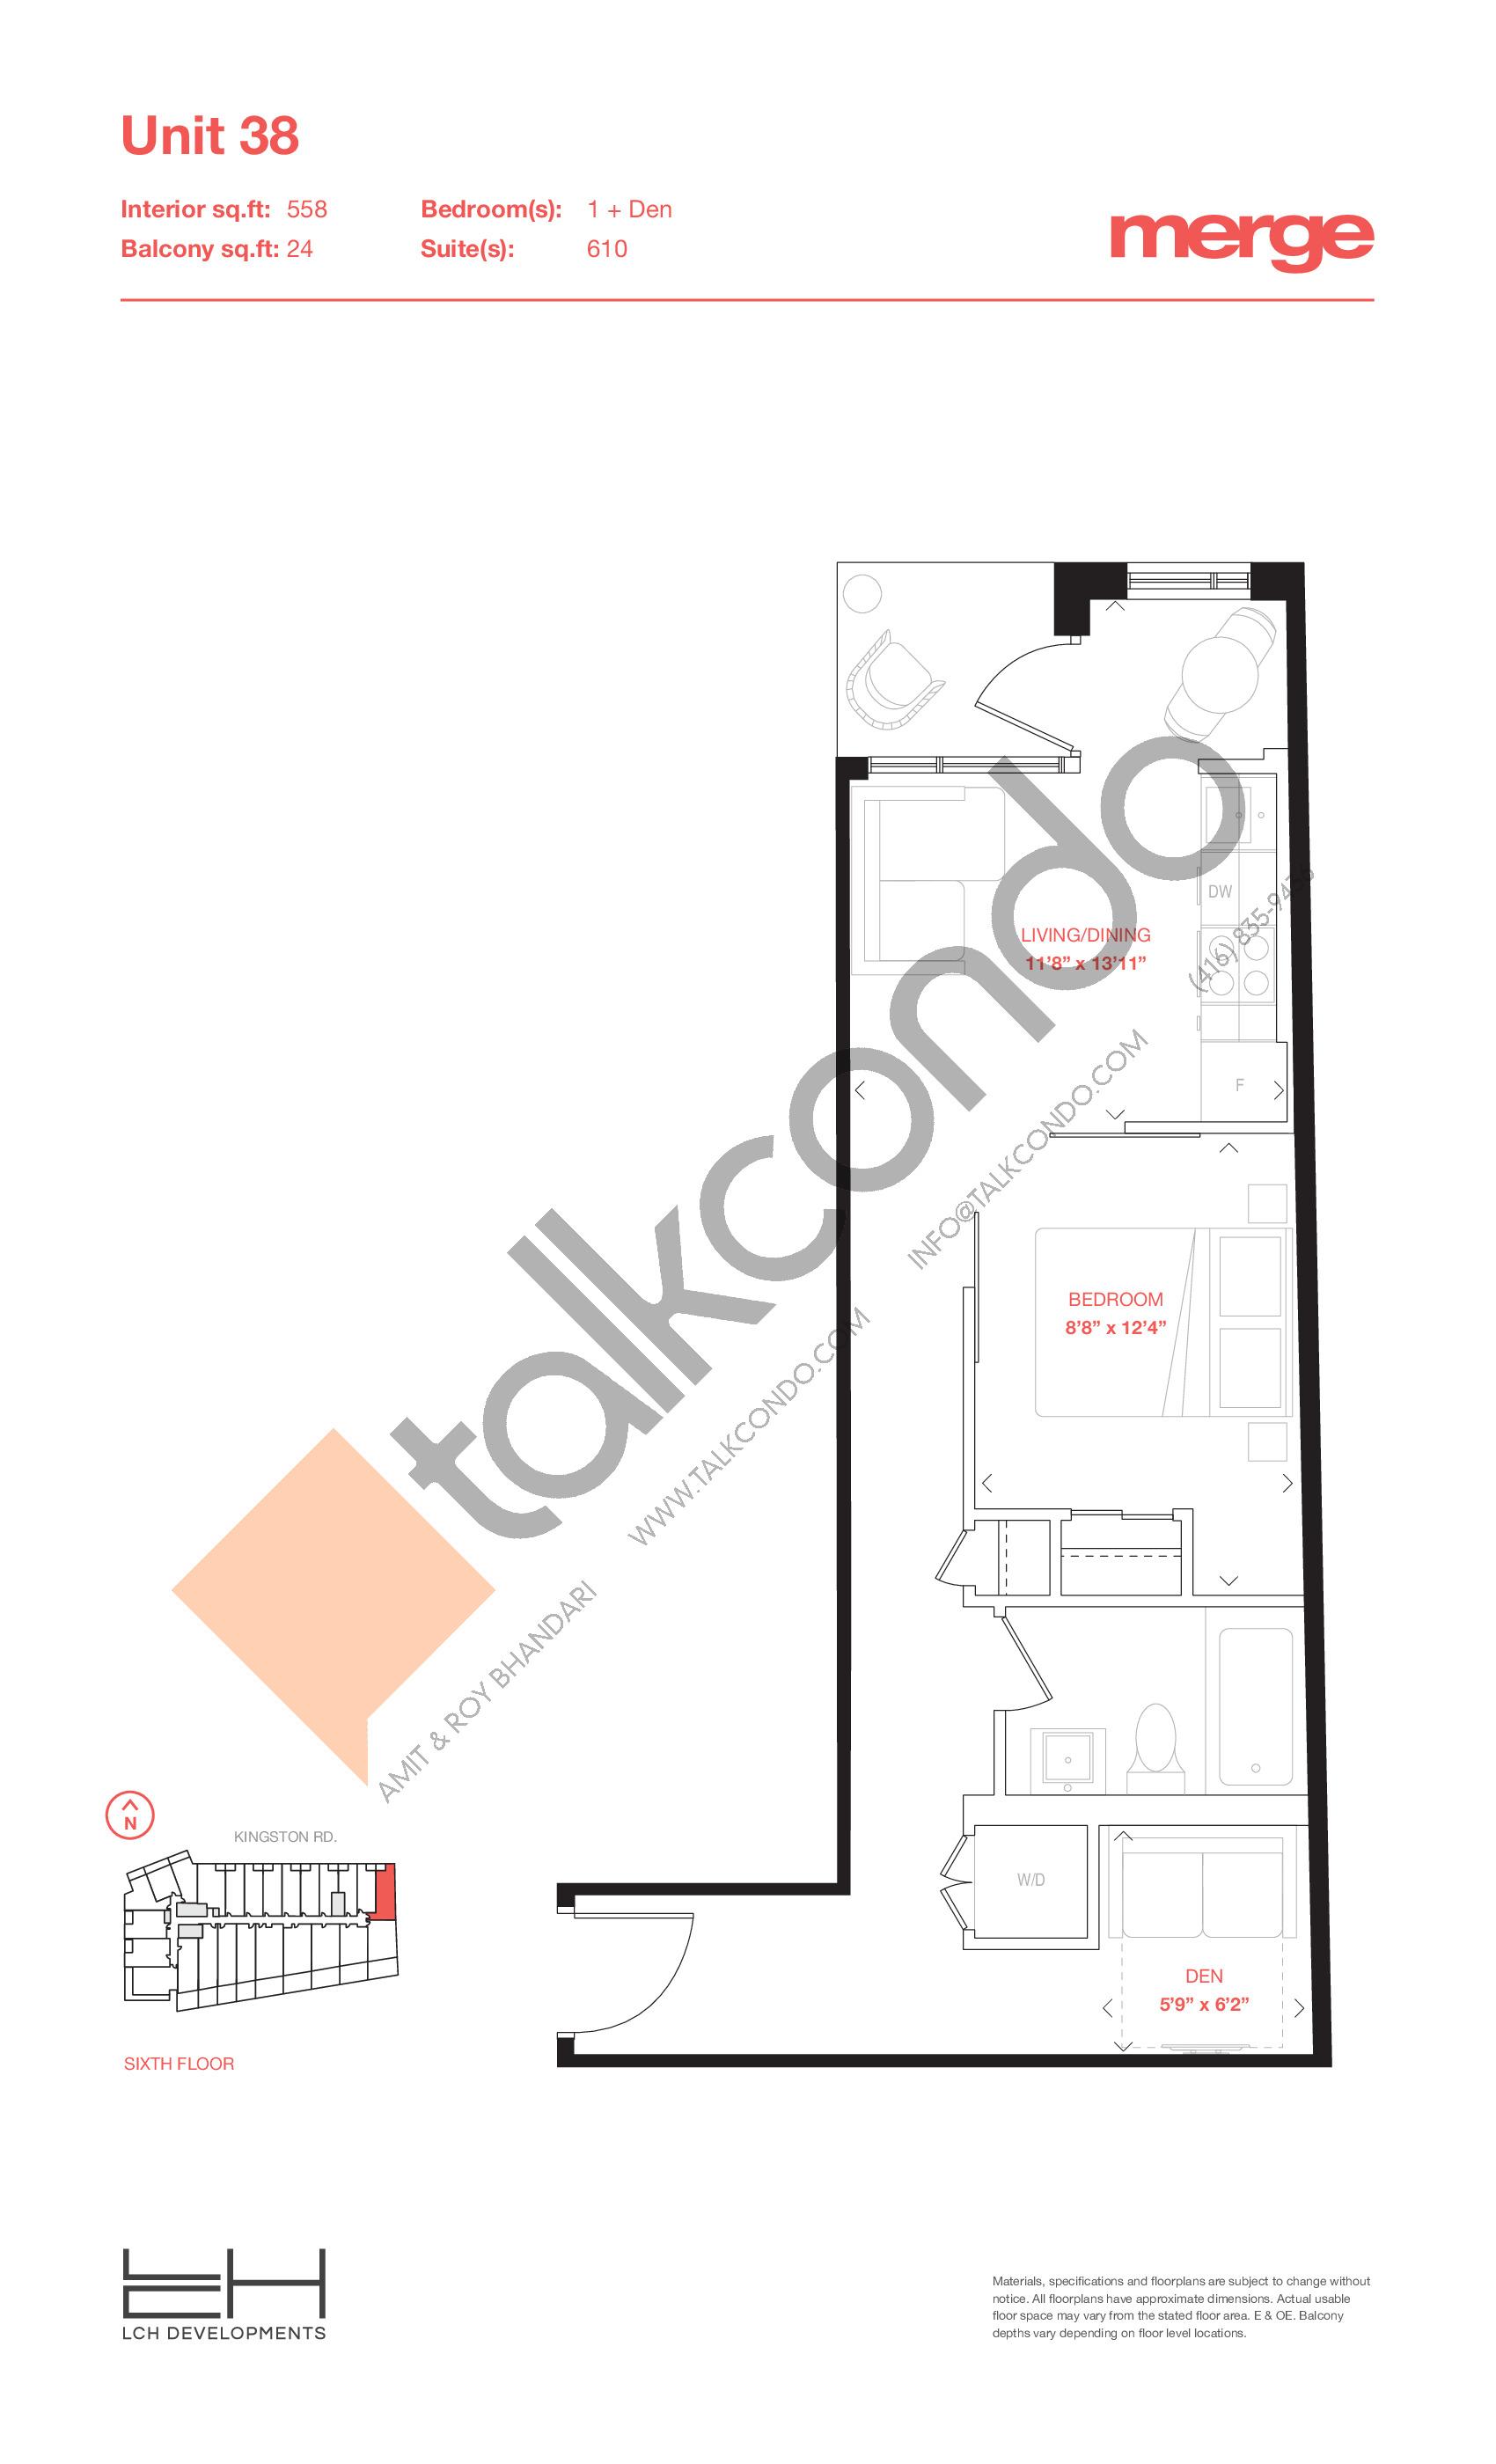 Unit 38 - Tower Floor Plan at Merge Condos - 558 sq.ft